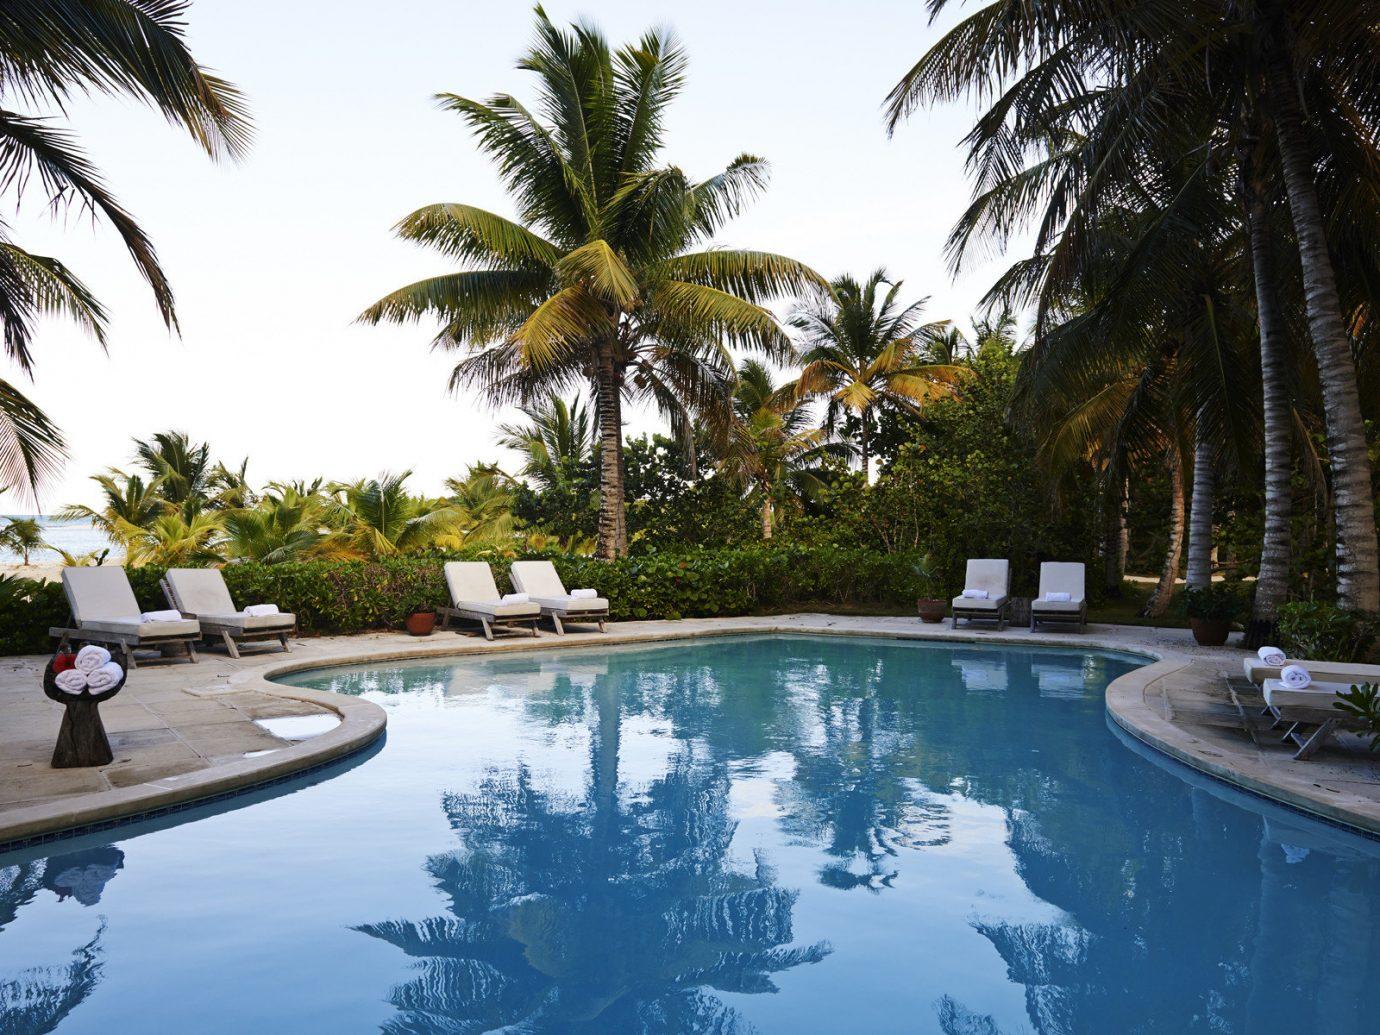 Kamalame Cay, The Bahamas